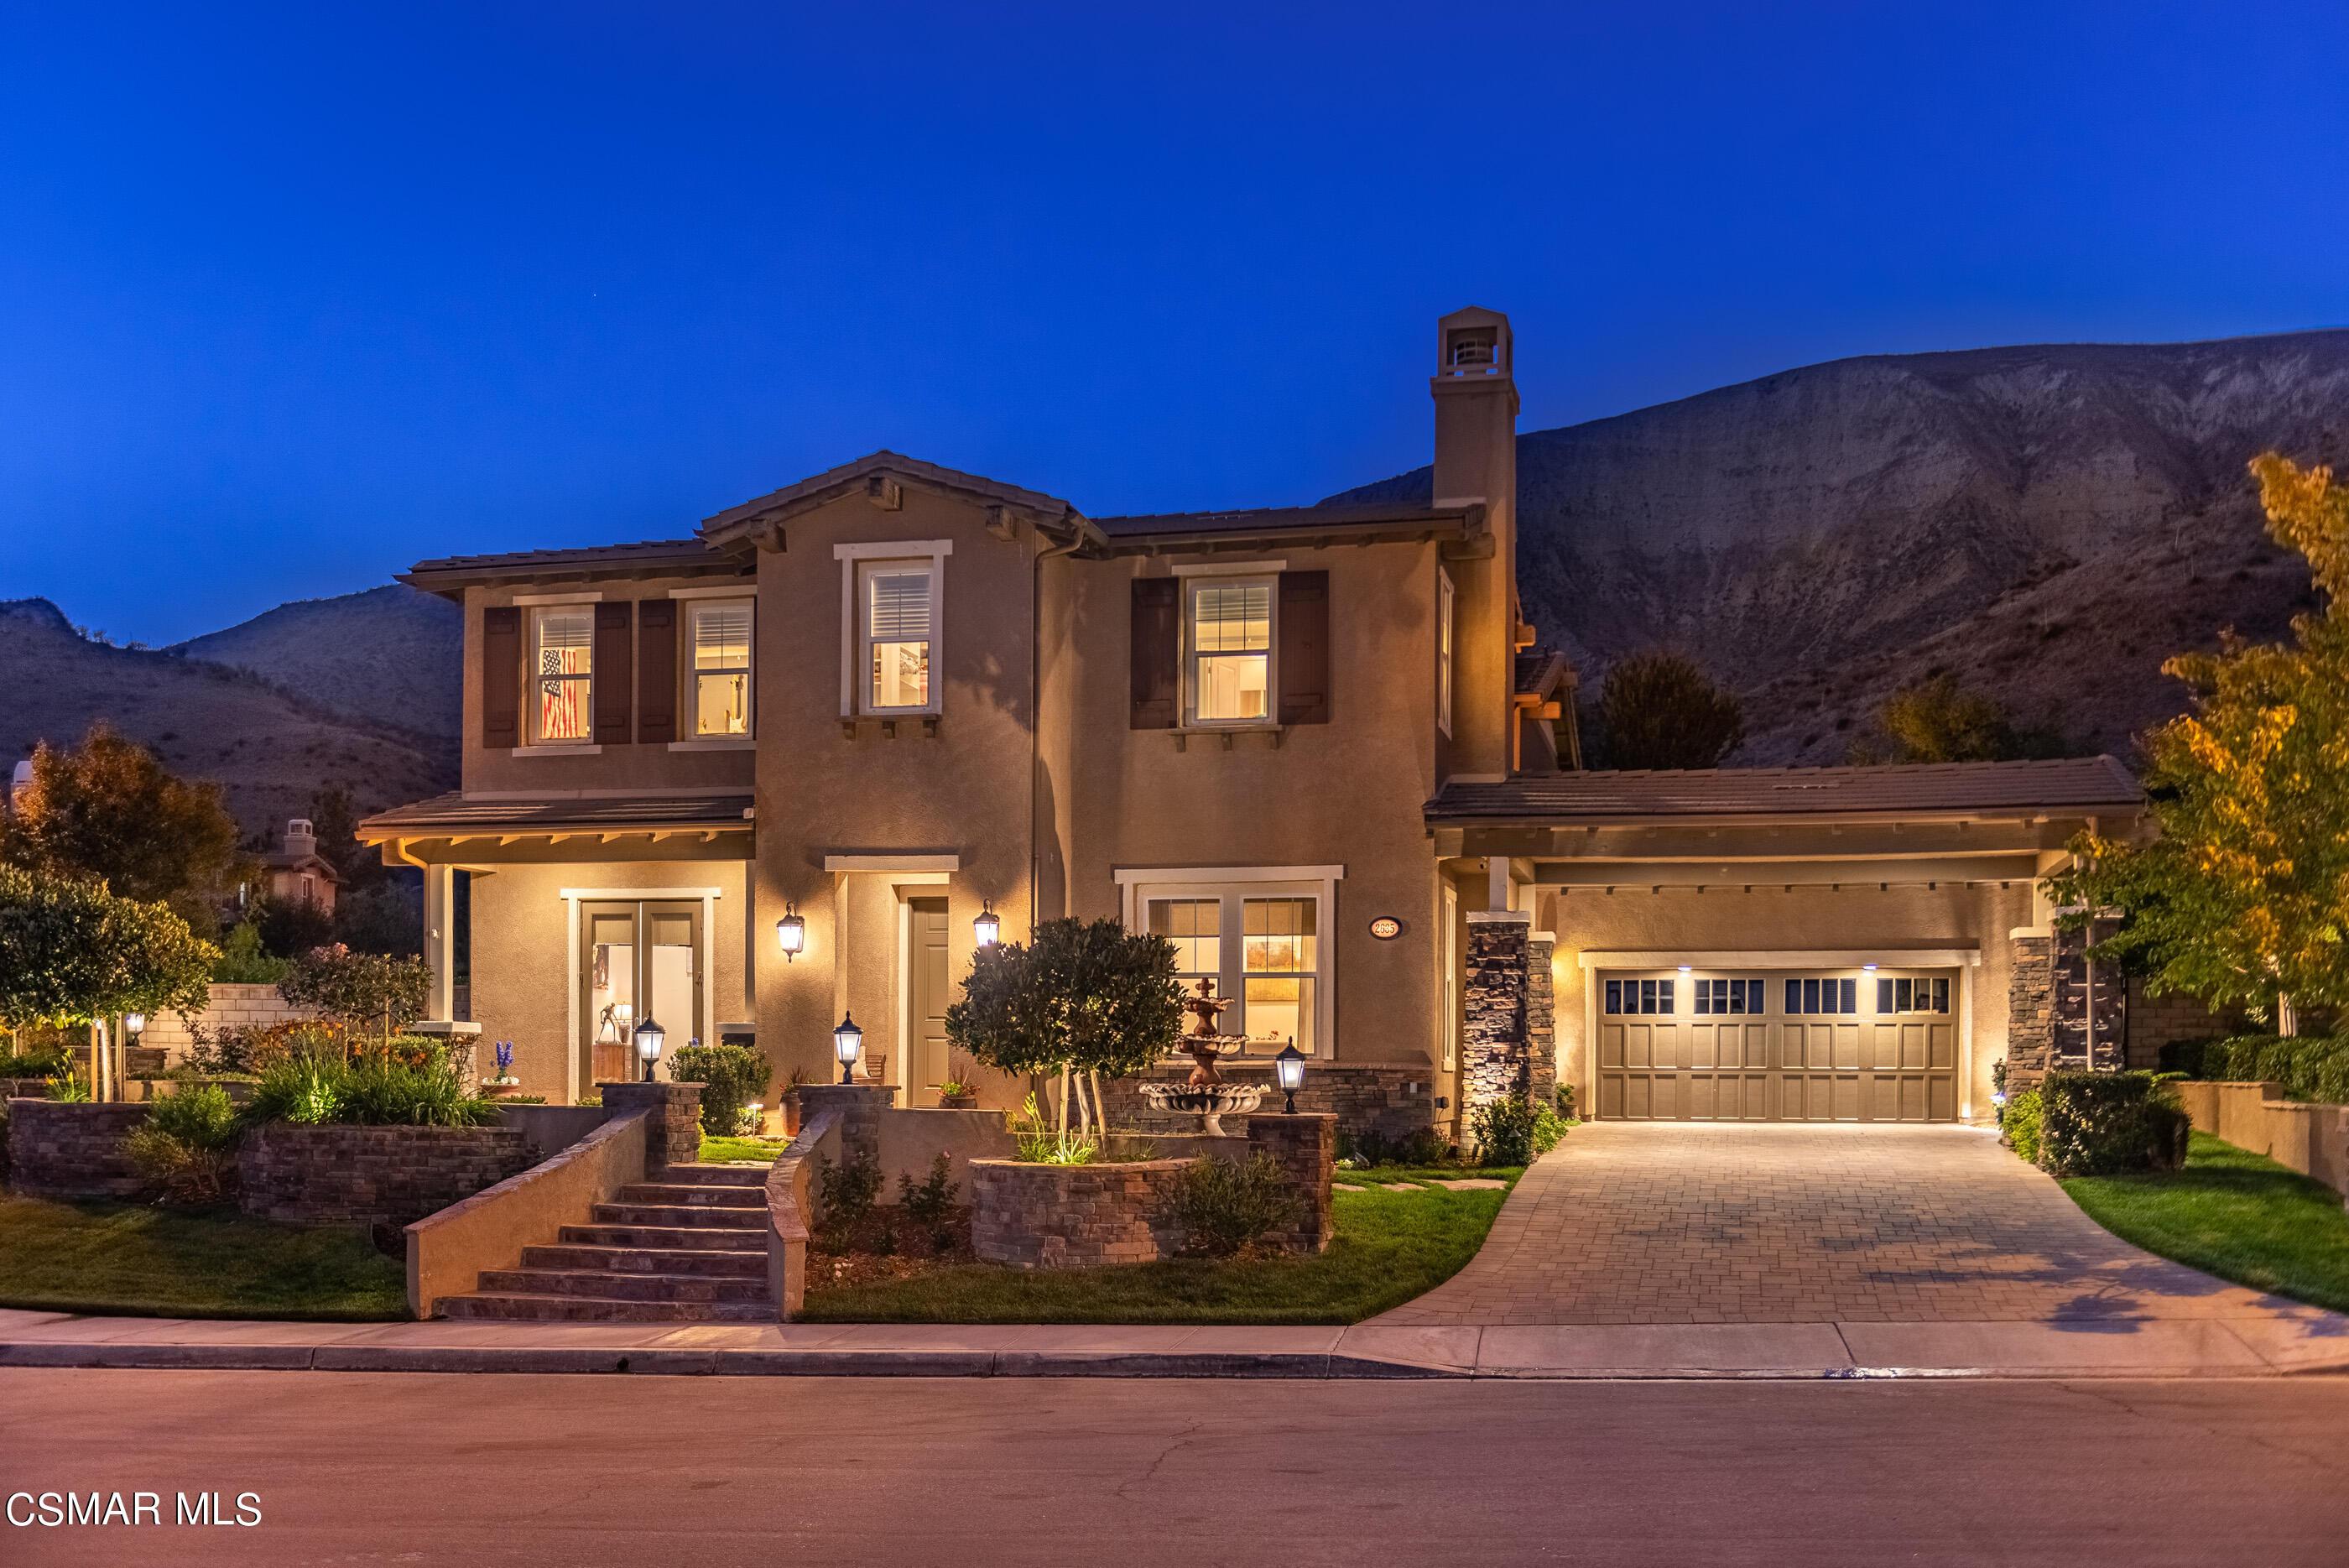 Photo of 2635 Castlewood Lane, Simi Valley, CA 93065